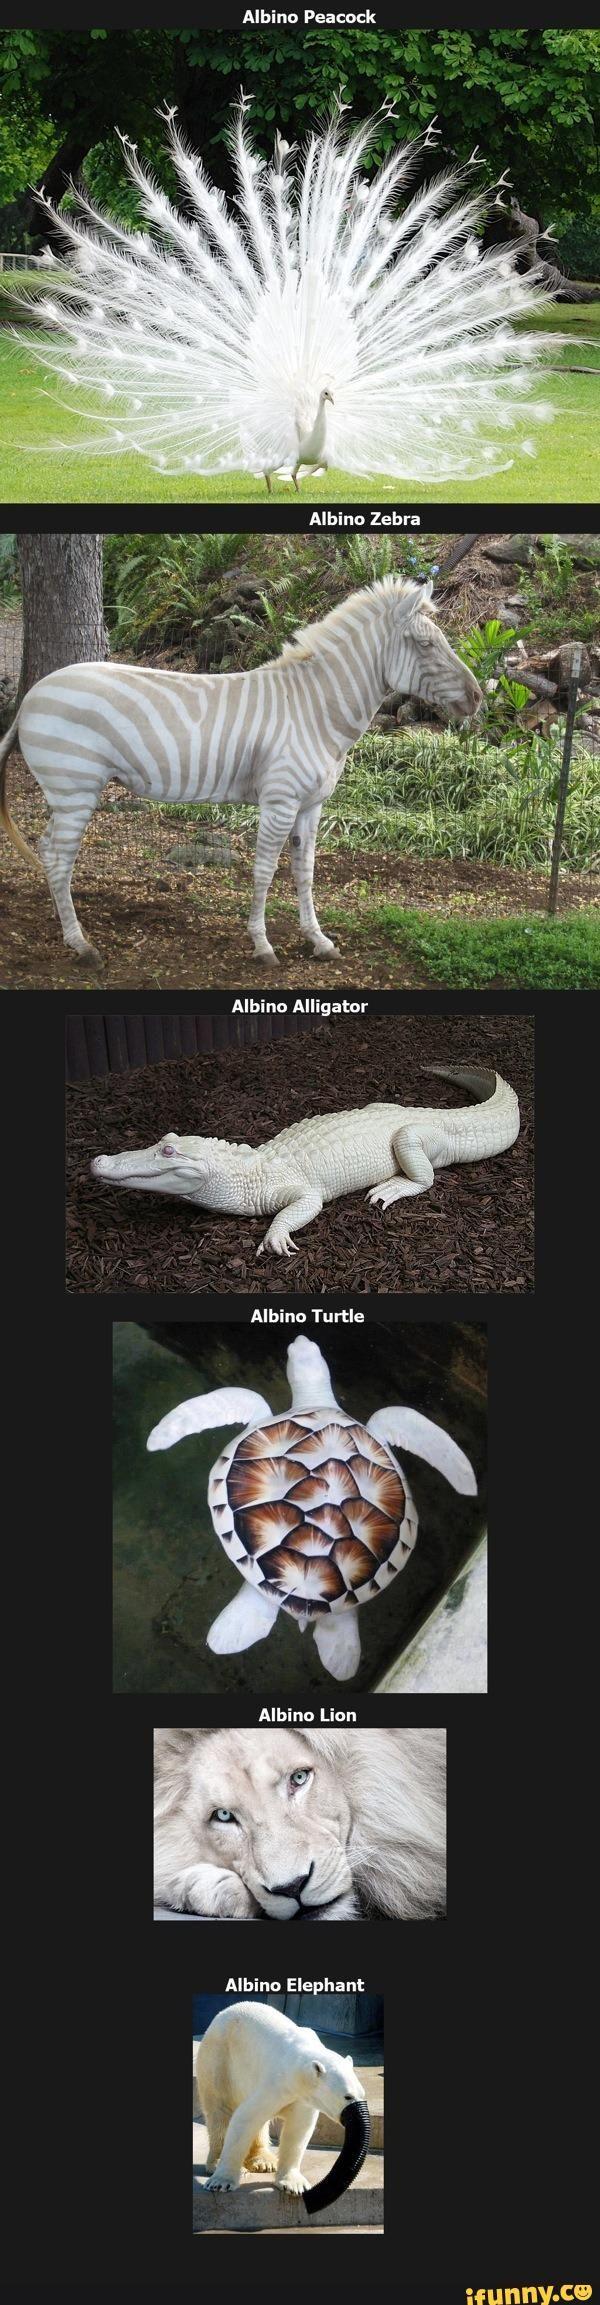 albine, animals